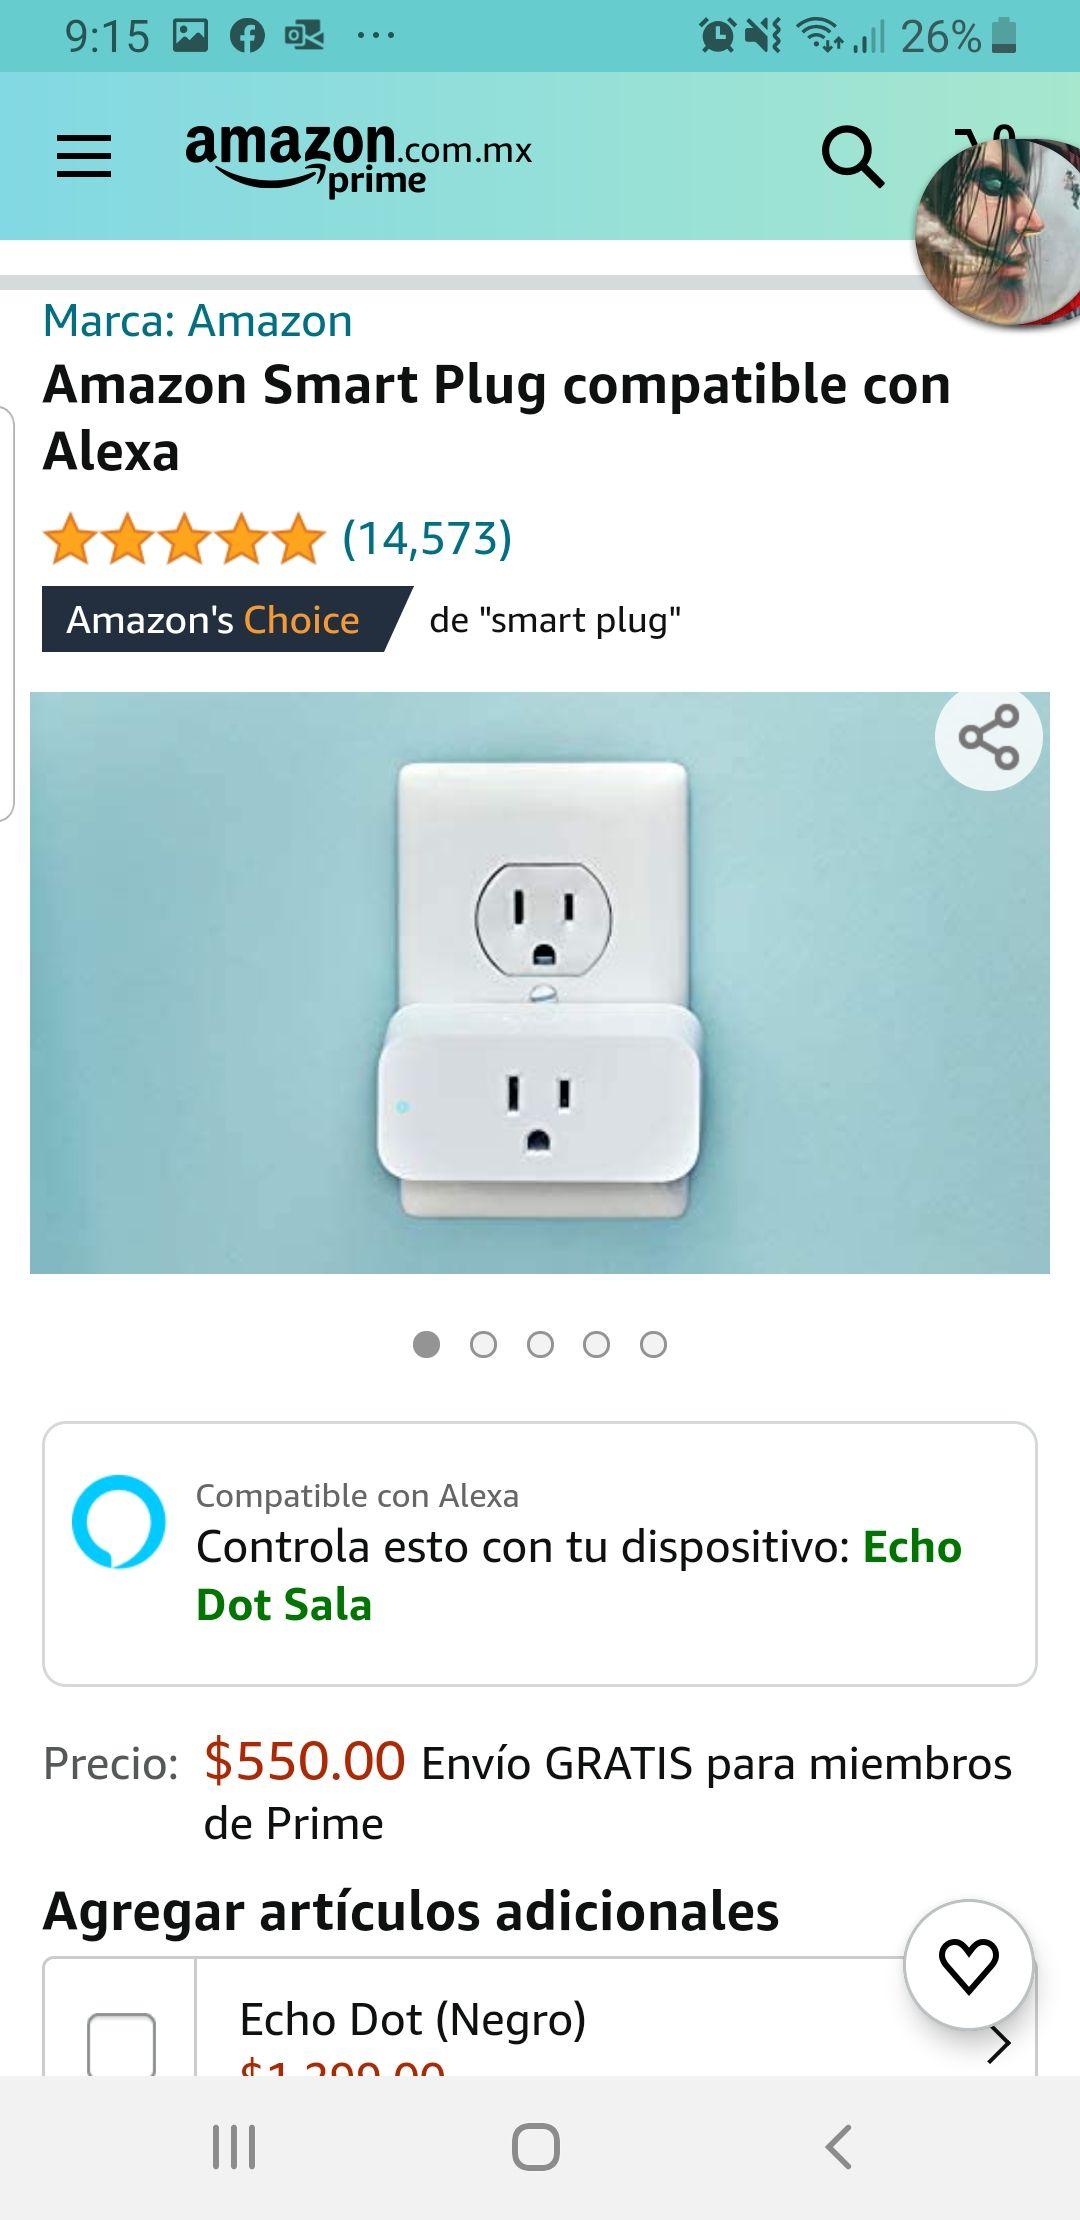 AMAZON: Smart Plug compatible con Alexa